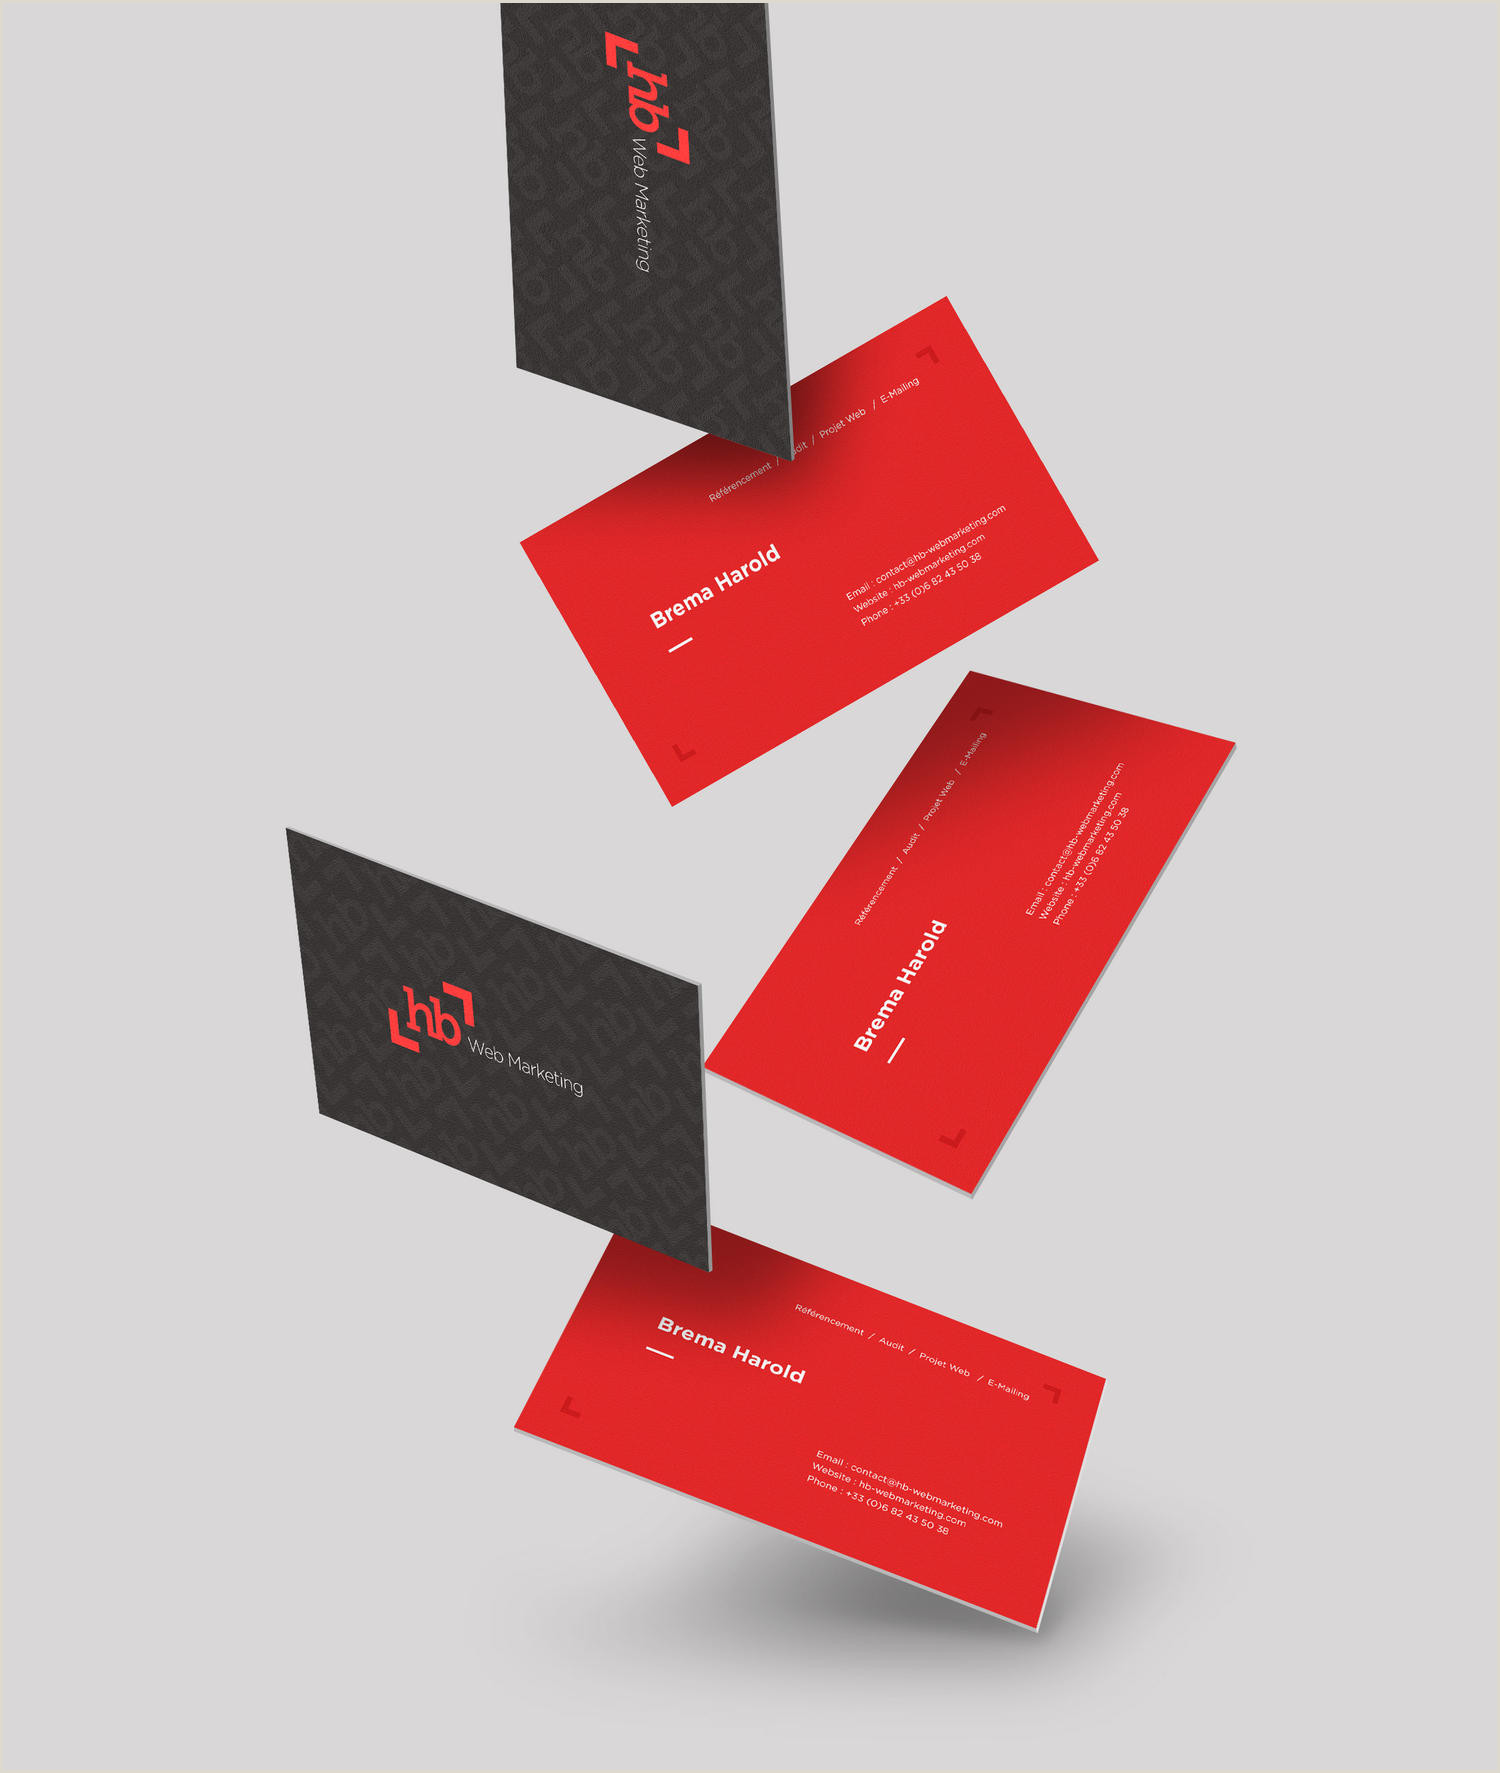 Font For Business Cards Business Card Design By Alanaragondesign On Envato Studio